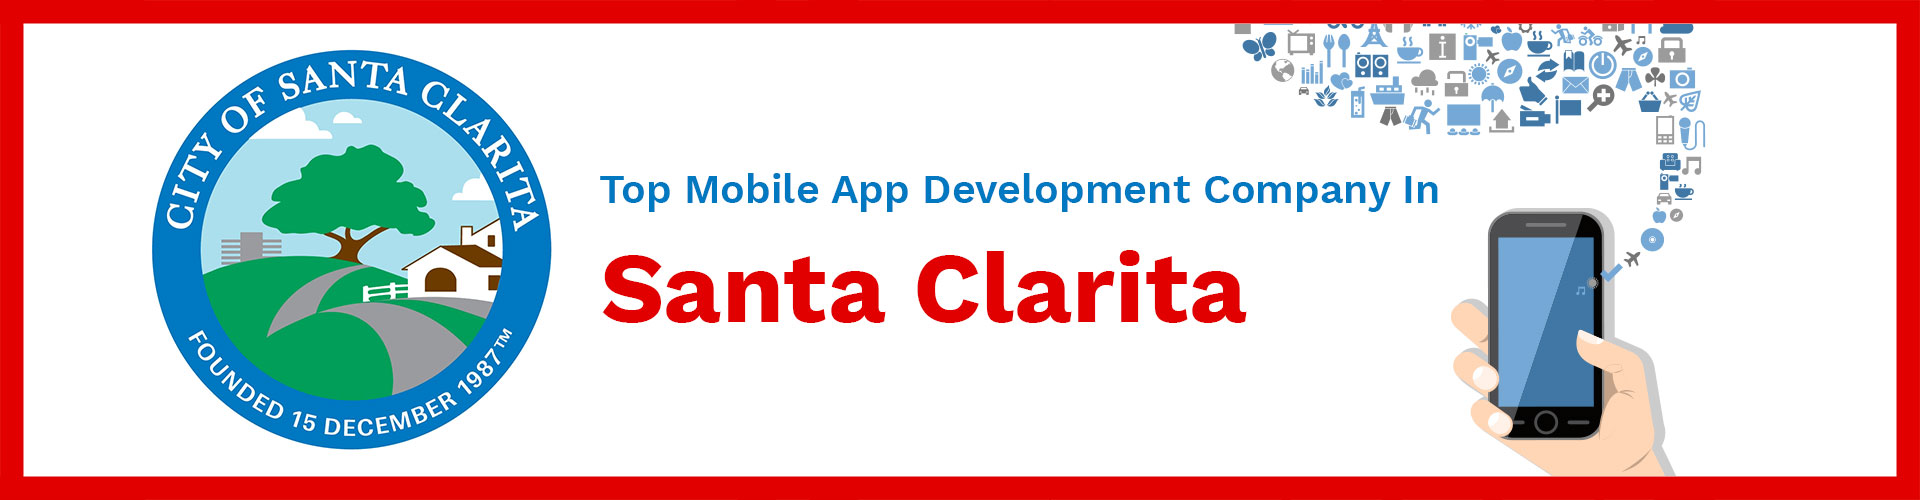 mobile app development company santa clarita